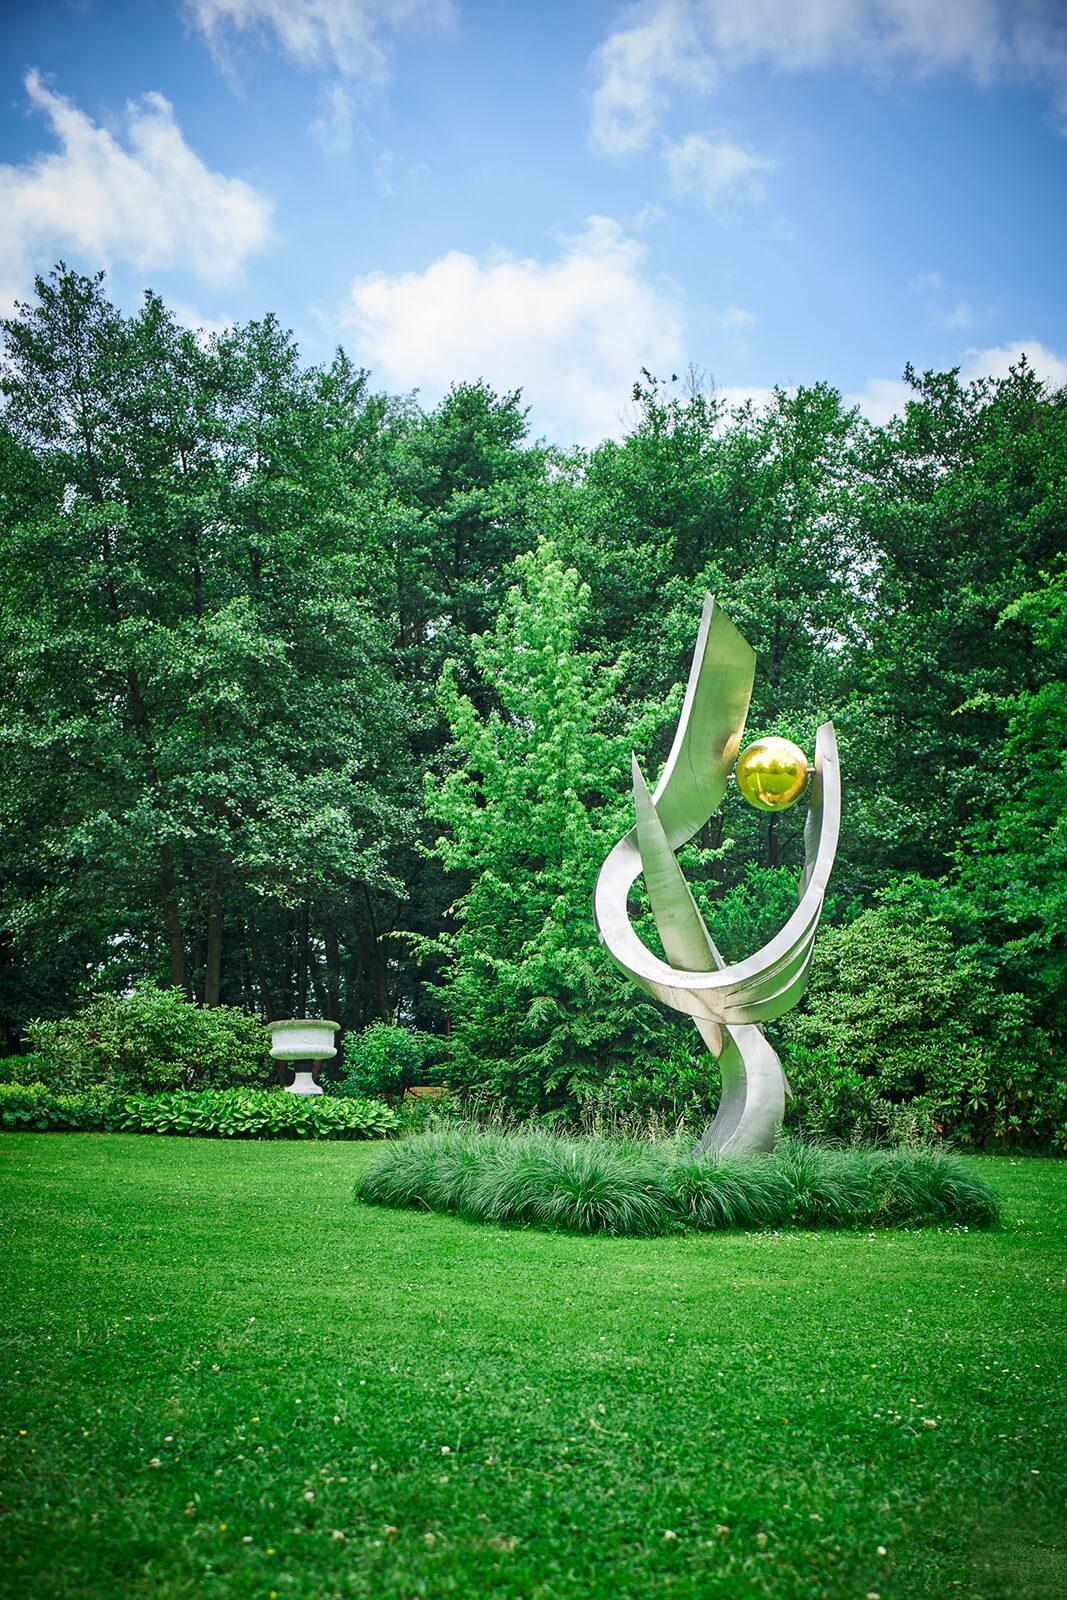 Full Size of Gartenskulptur Edelstahl Stein Gartenskulpturen Stein Kaufen Modern Skulpturen Garten Aus Edelstahl Italien Steinguss Selber Machen Antik Buddha Garten Skulpturen Garten